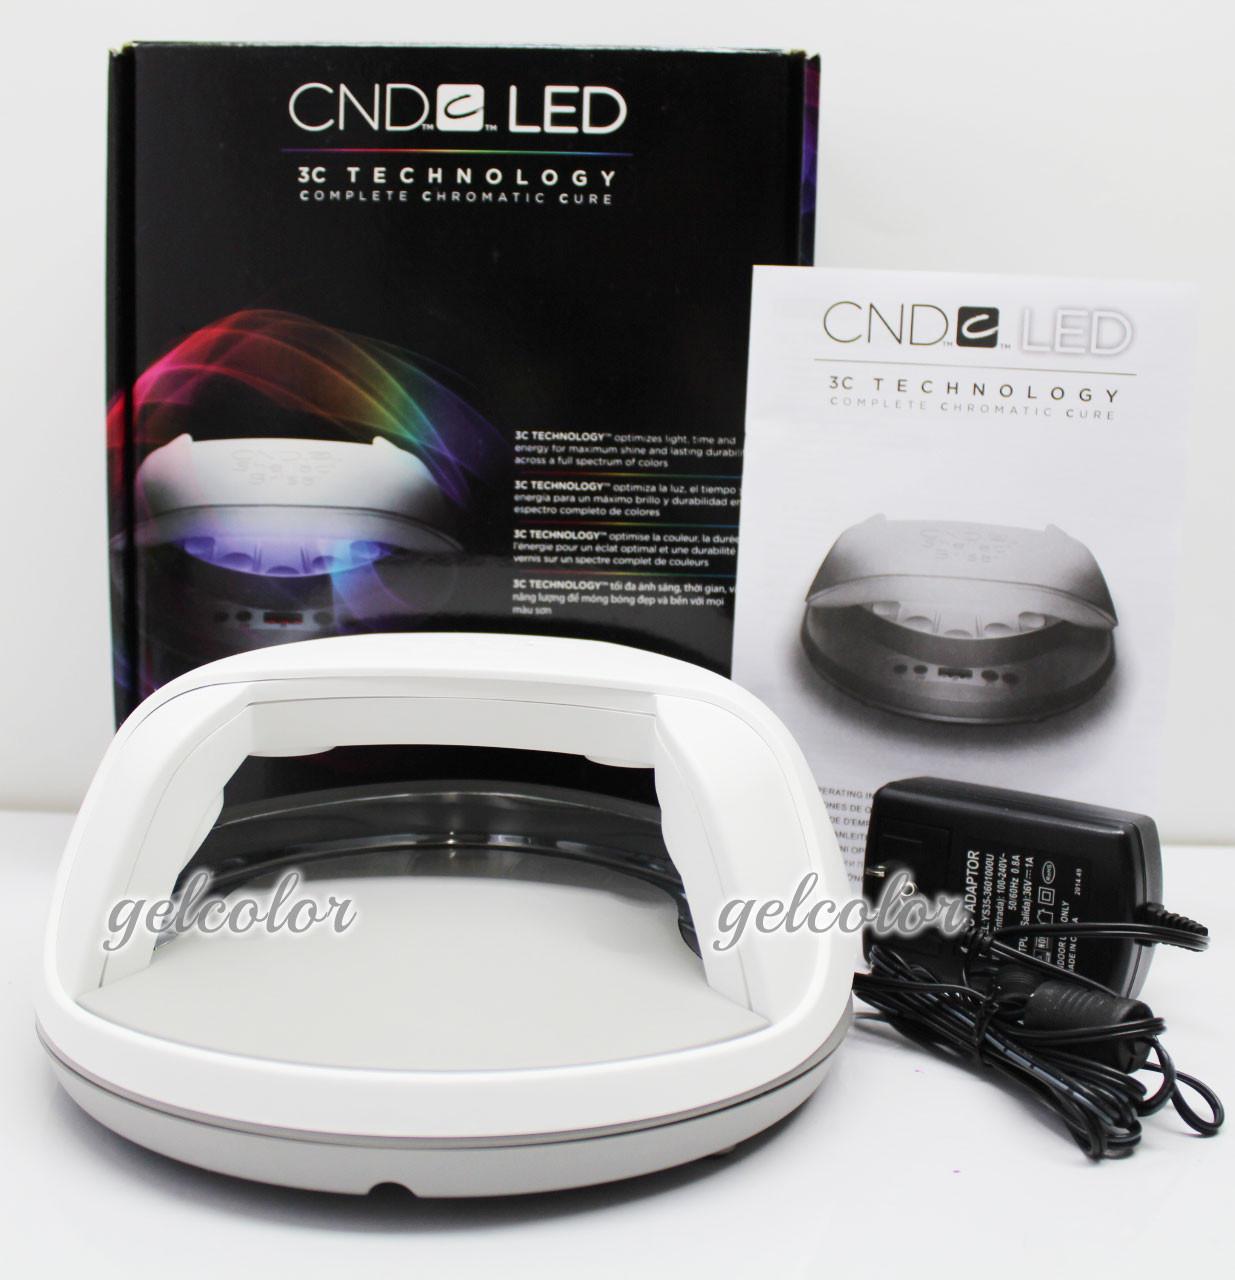 Led Free Light Eu Plug110v Nail Dryer Tech Lite Uk Cure Cnd Shellac Brisa Au 220v 3c Nz Lamp Ac3R4jLS5q